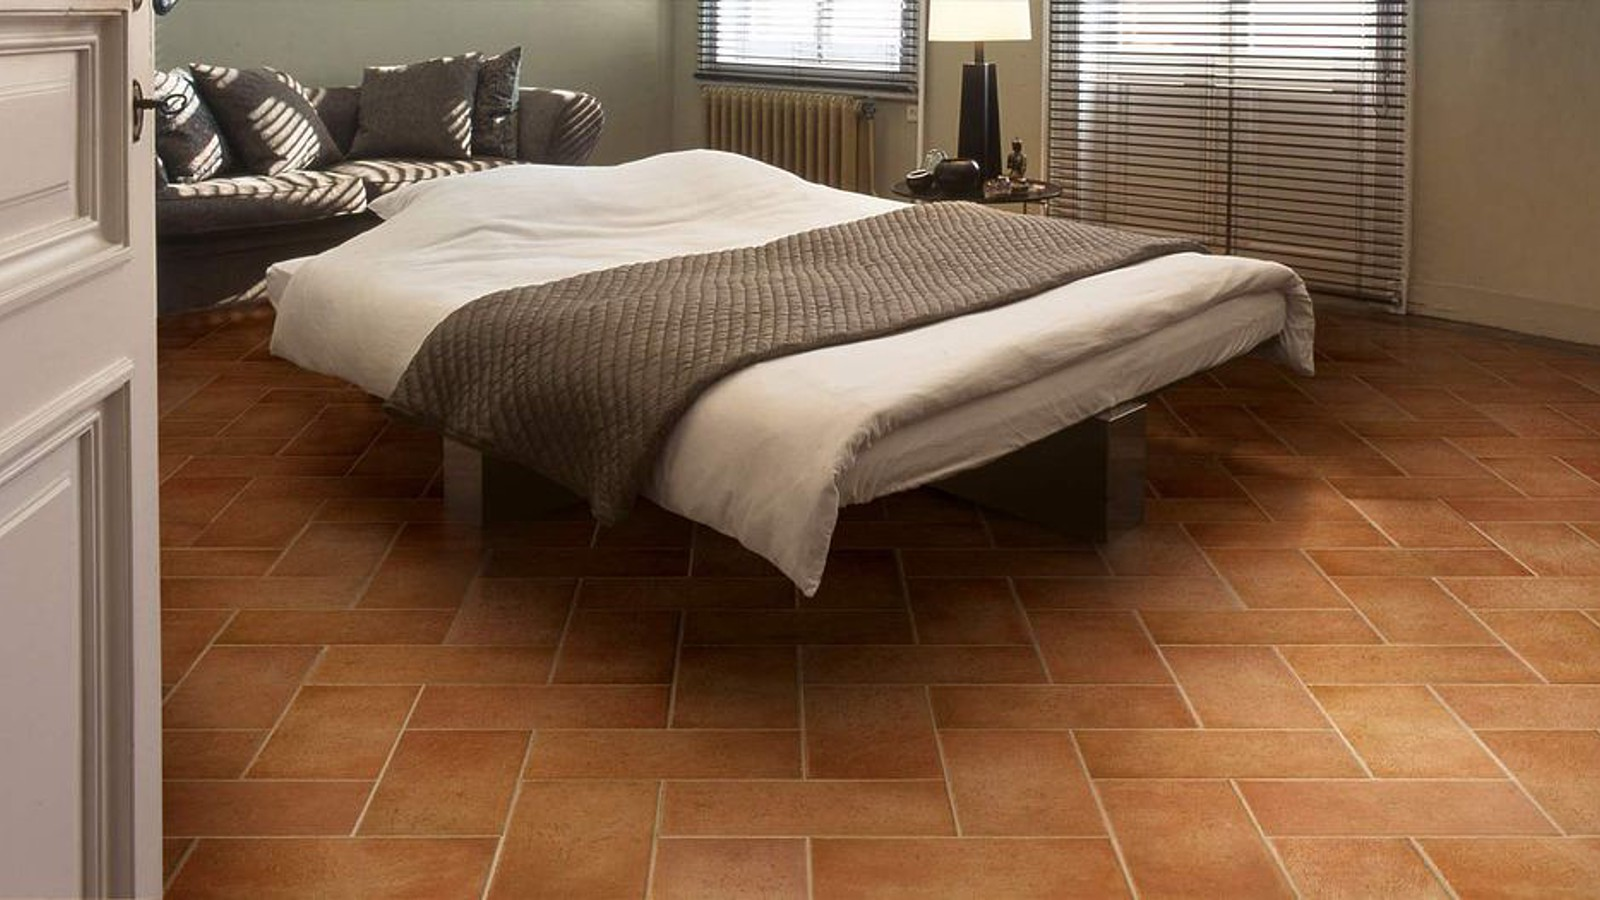 Cotto antico porcelain tiles by marazzi tile expert for Marazzi cotto d italia